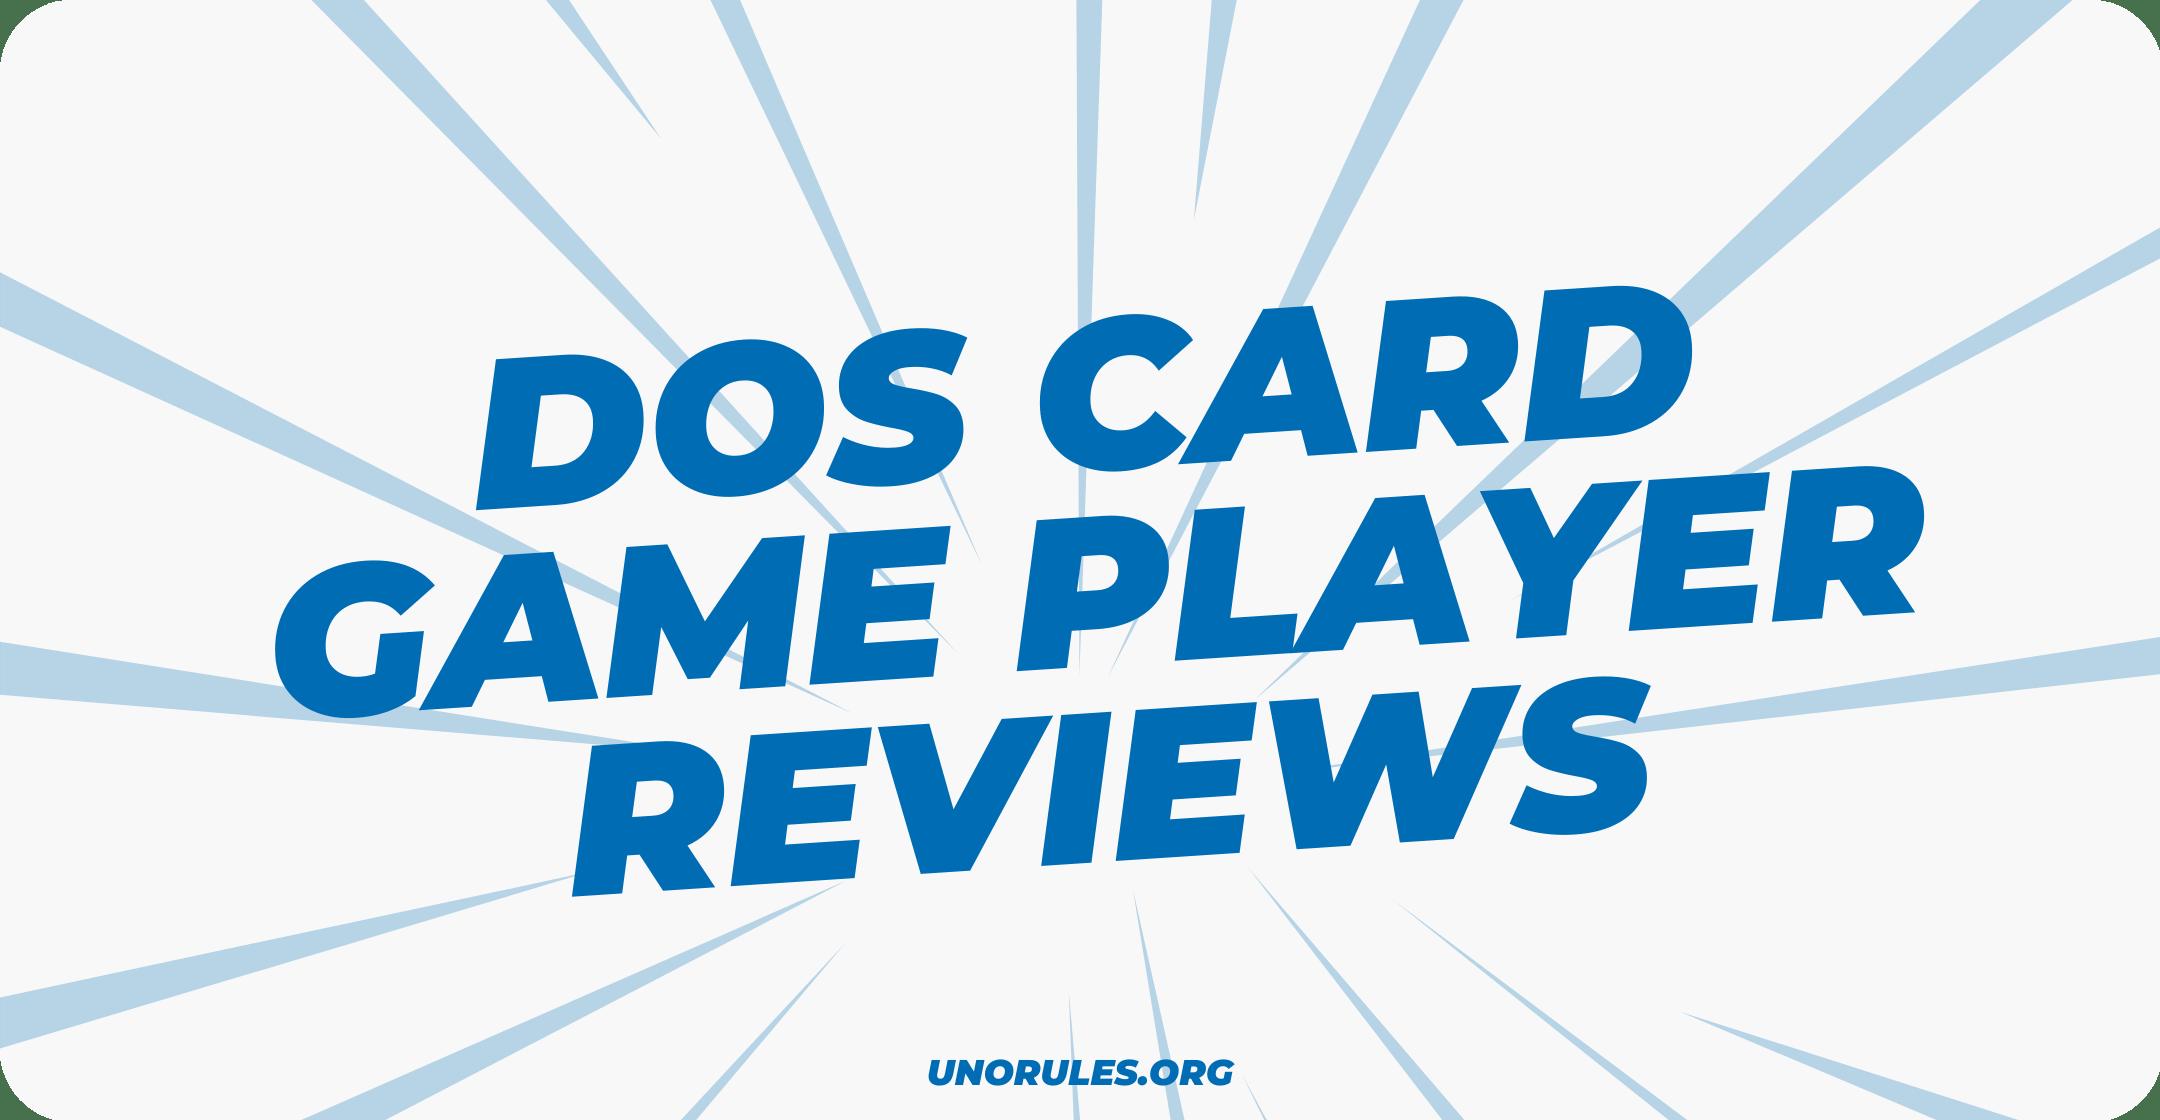 Dos card game player reviews